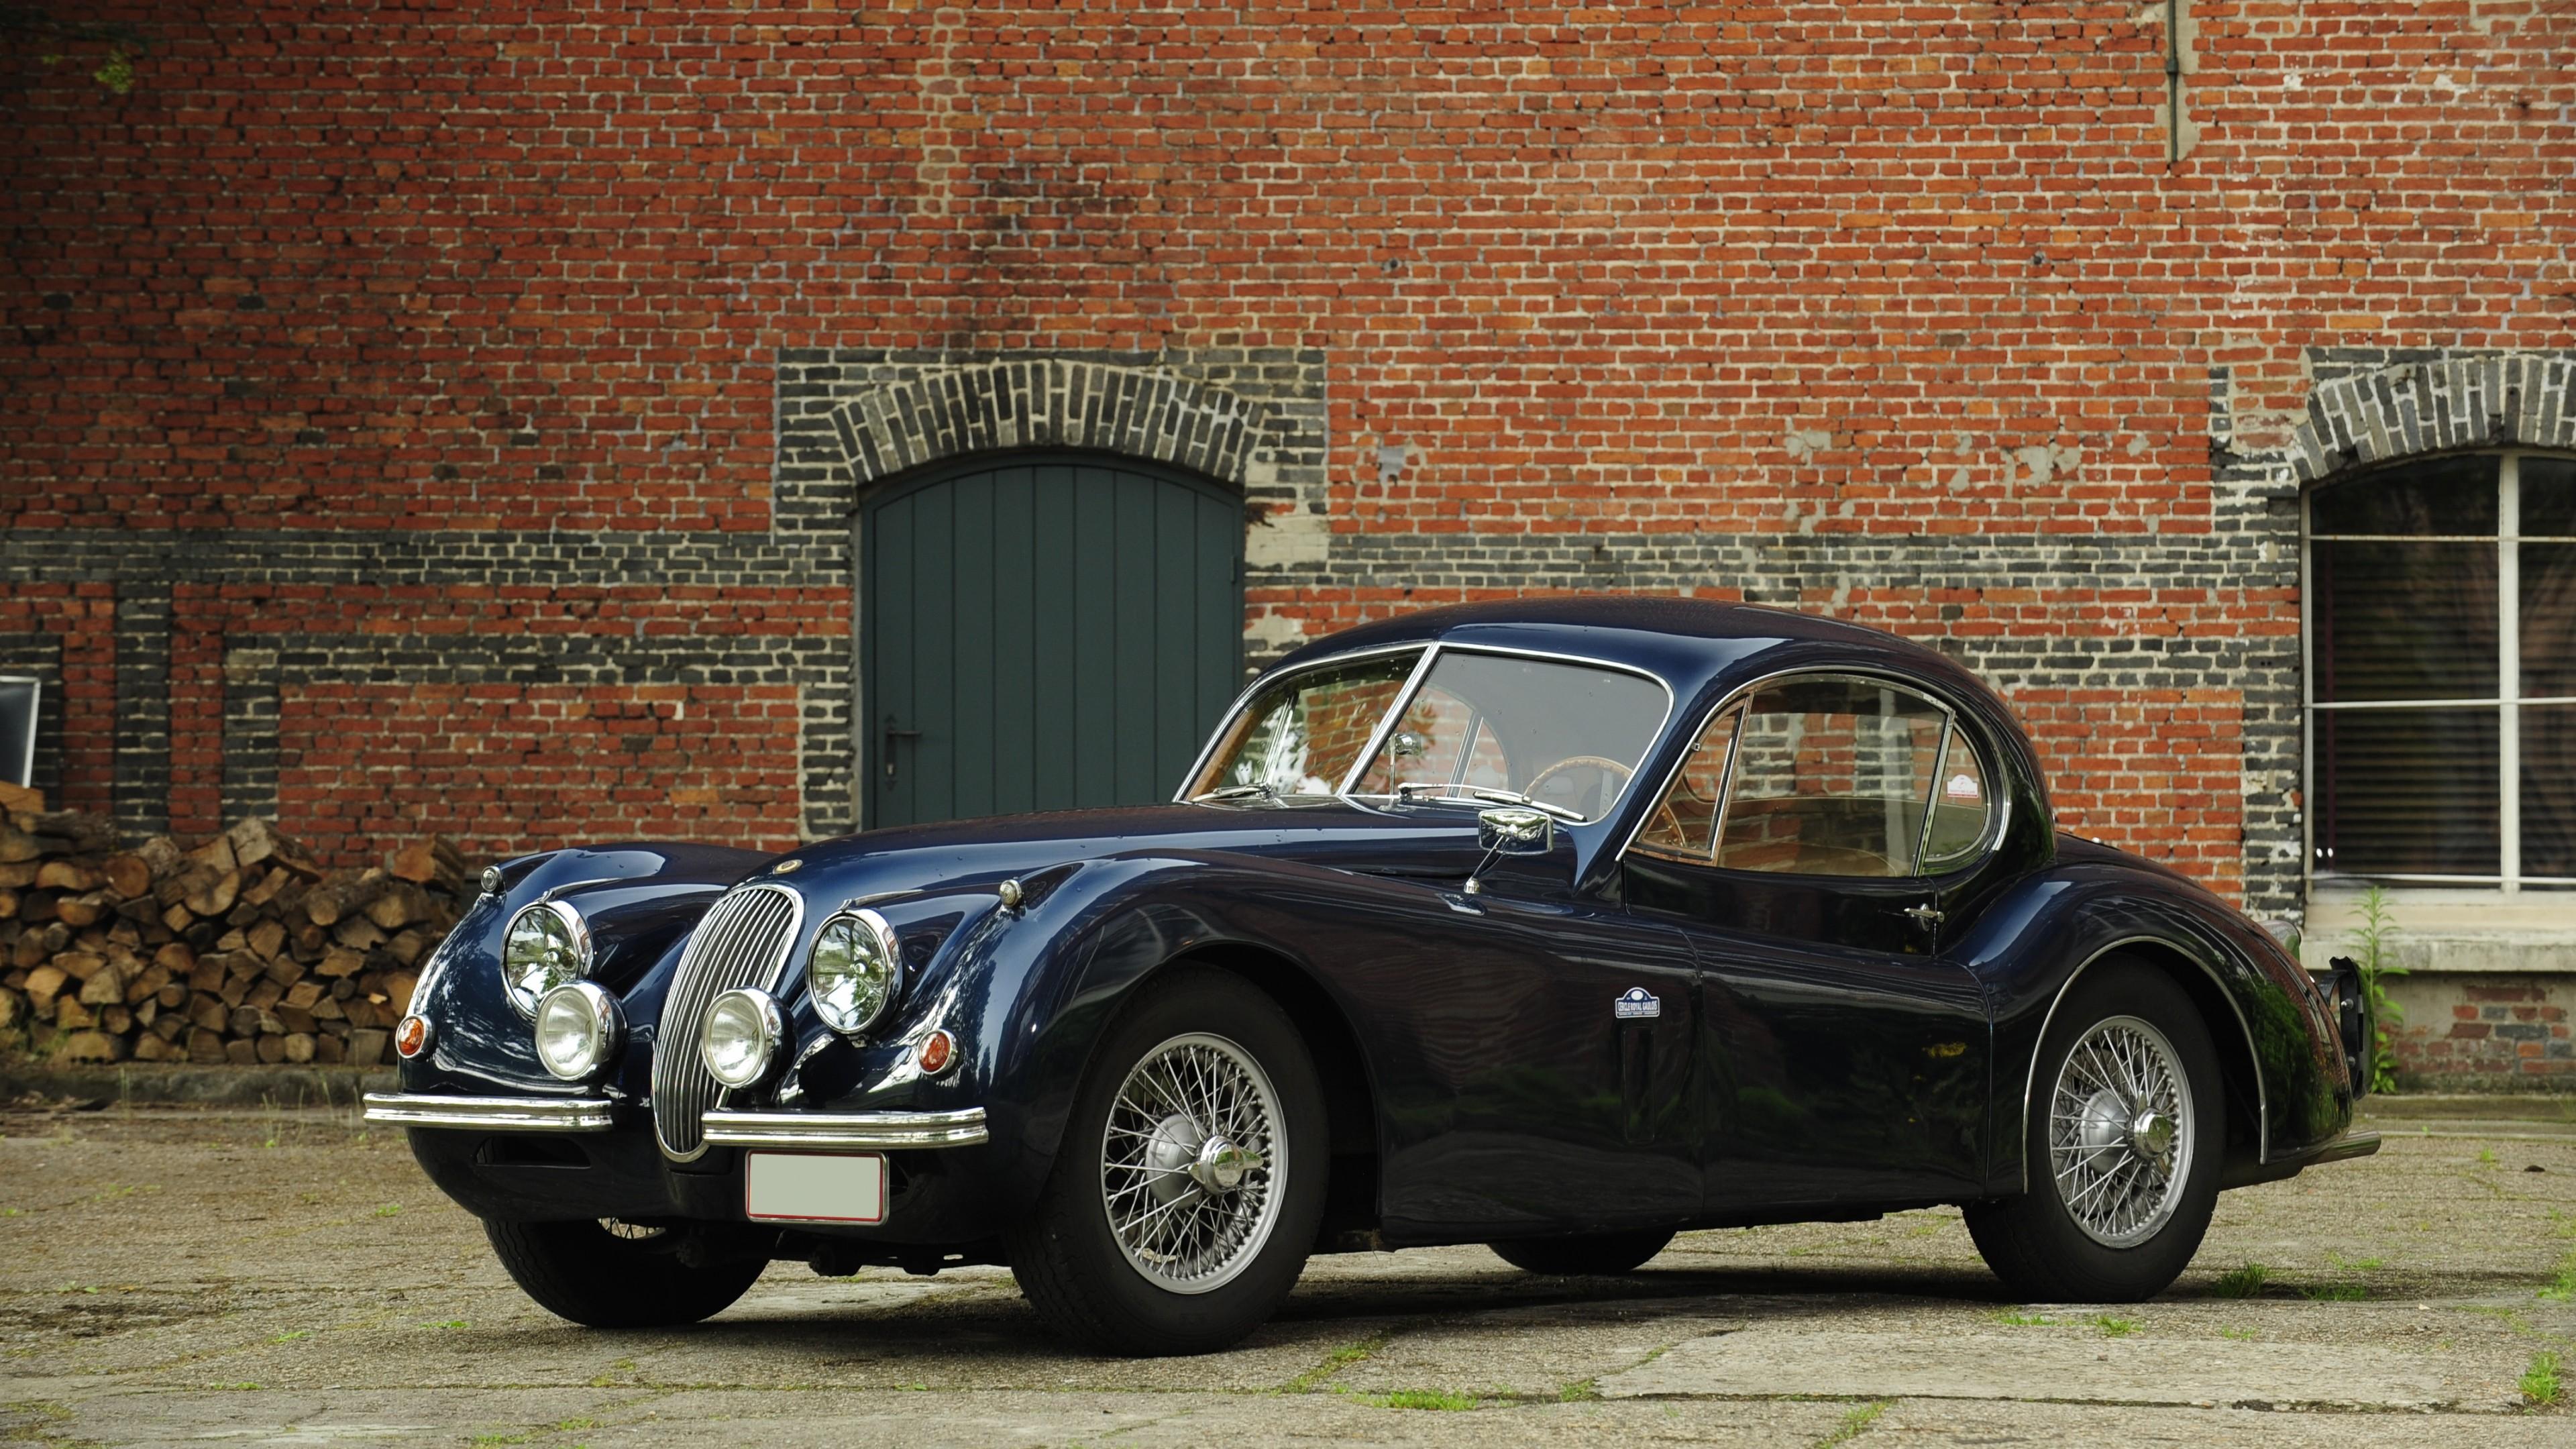 Wallpaper Jaguar Xk120 Classic Cars Jaguar Retro